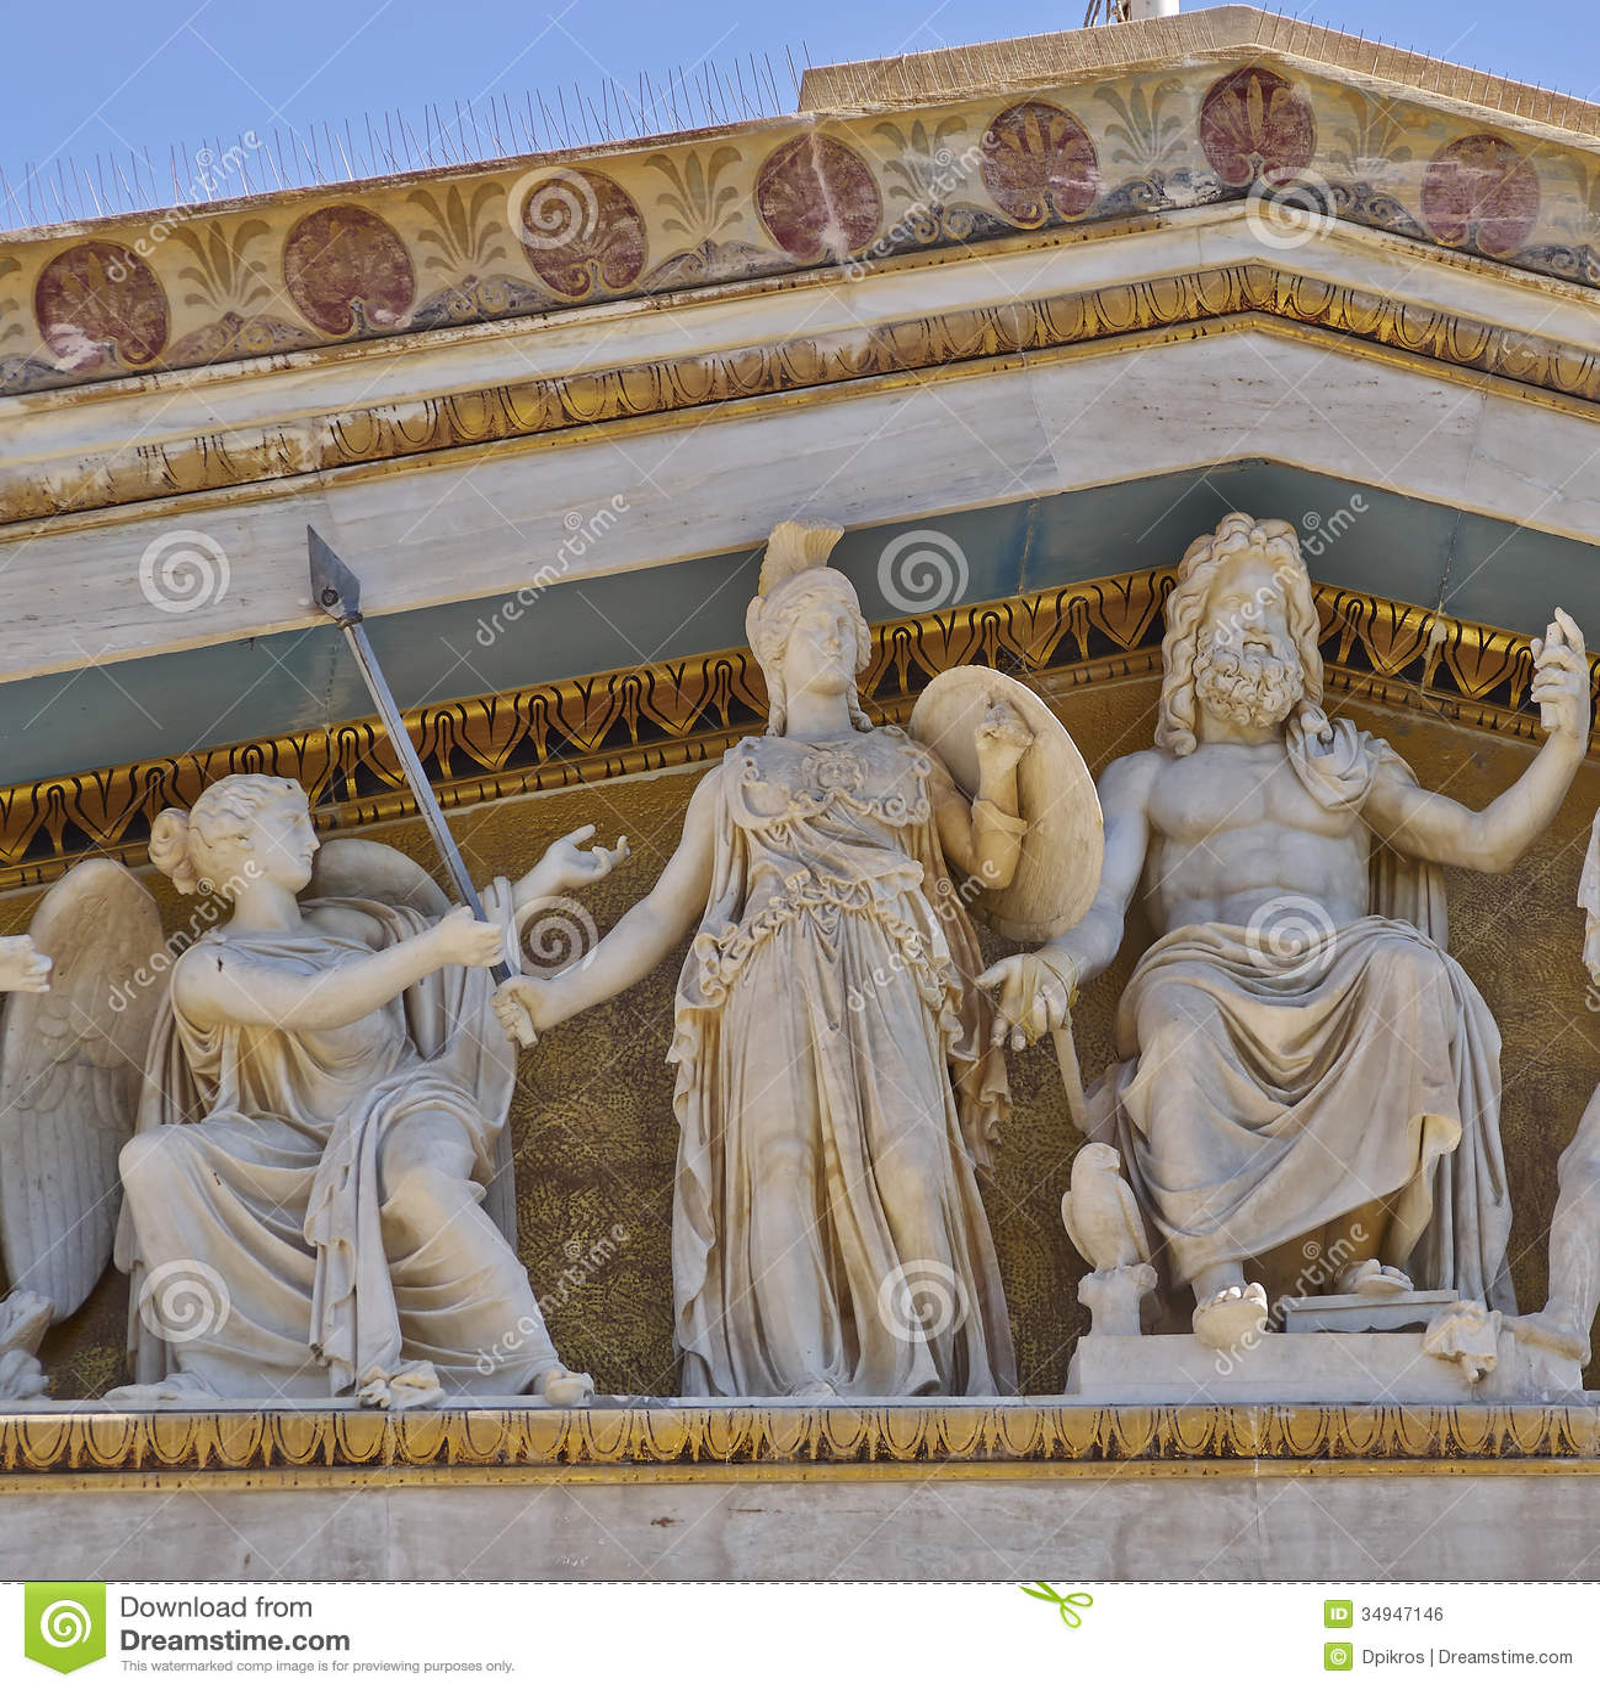 Zeus, Αθηνά και άλλοι Θεοί και θεότητες αρχαίου Έλληνα